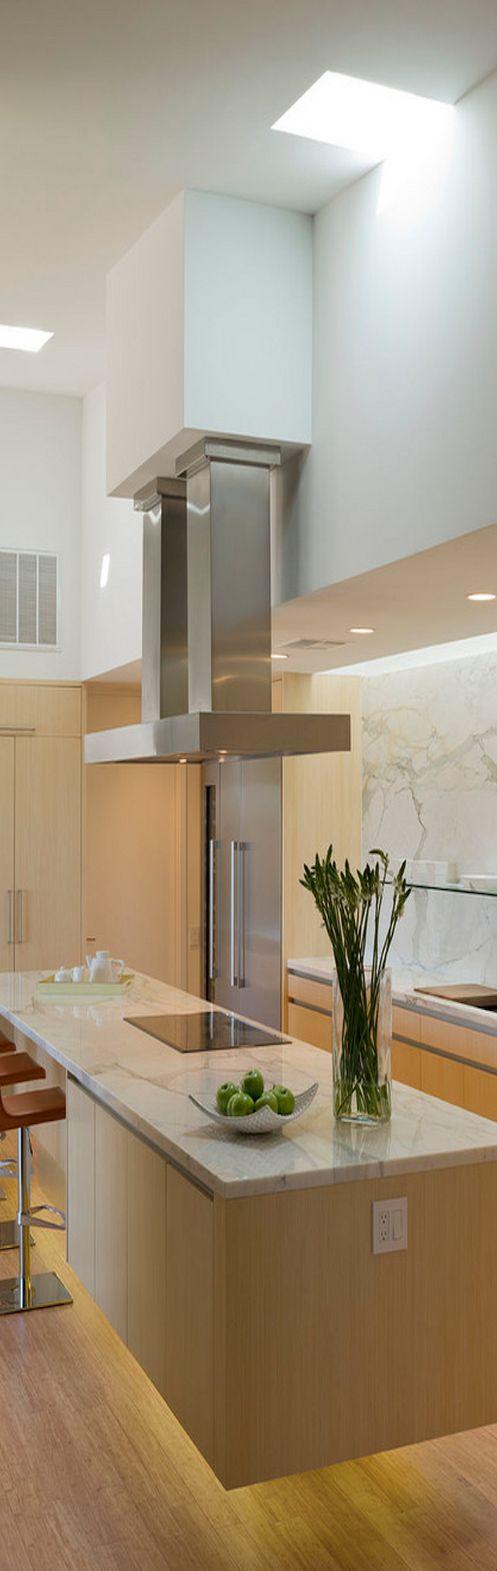 Modern Kitchen Marble Backsplash : Great marble backsplash...forget about the marble backsplash, look at ...